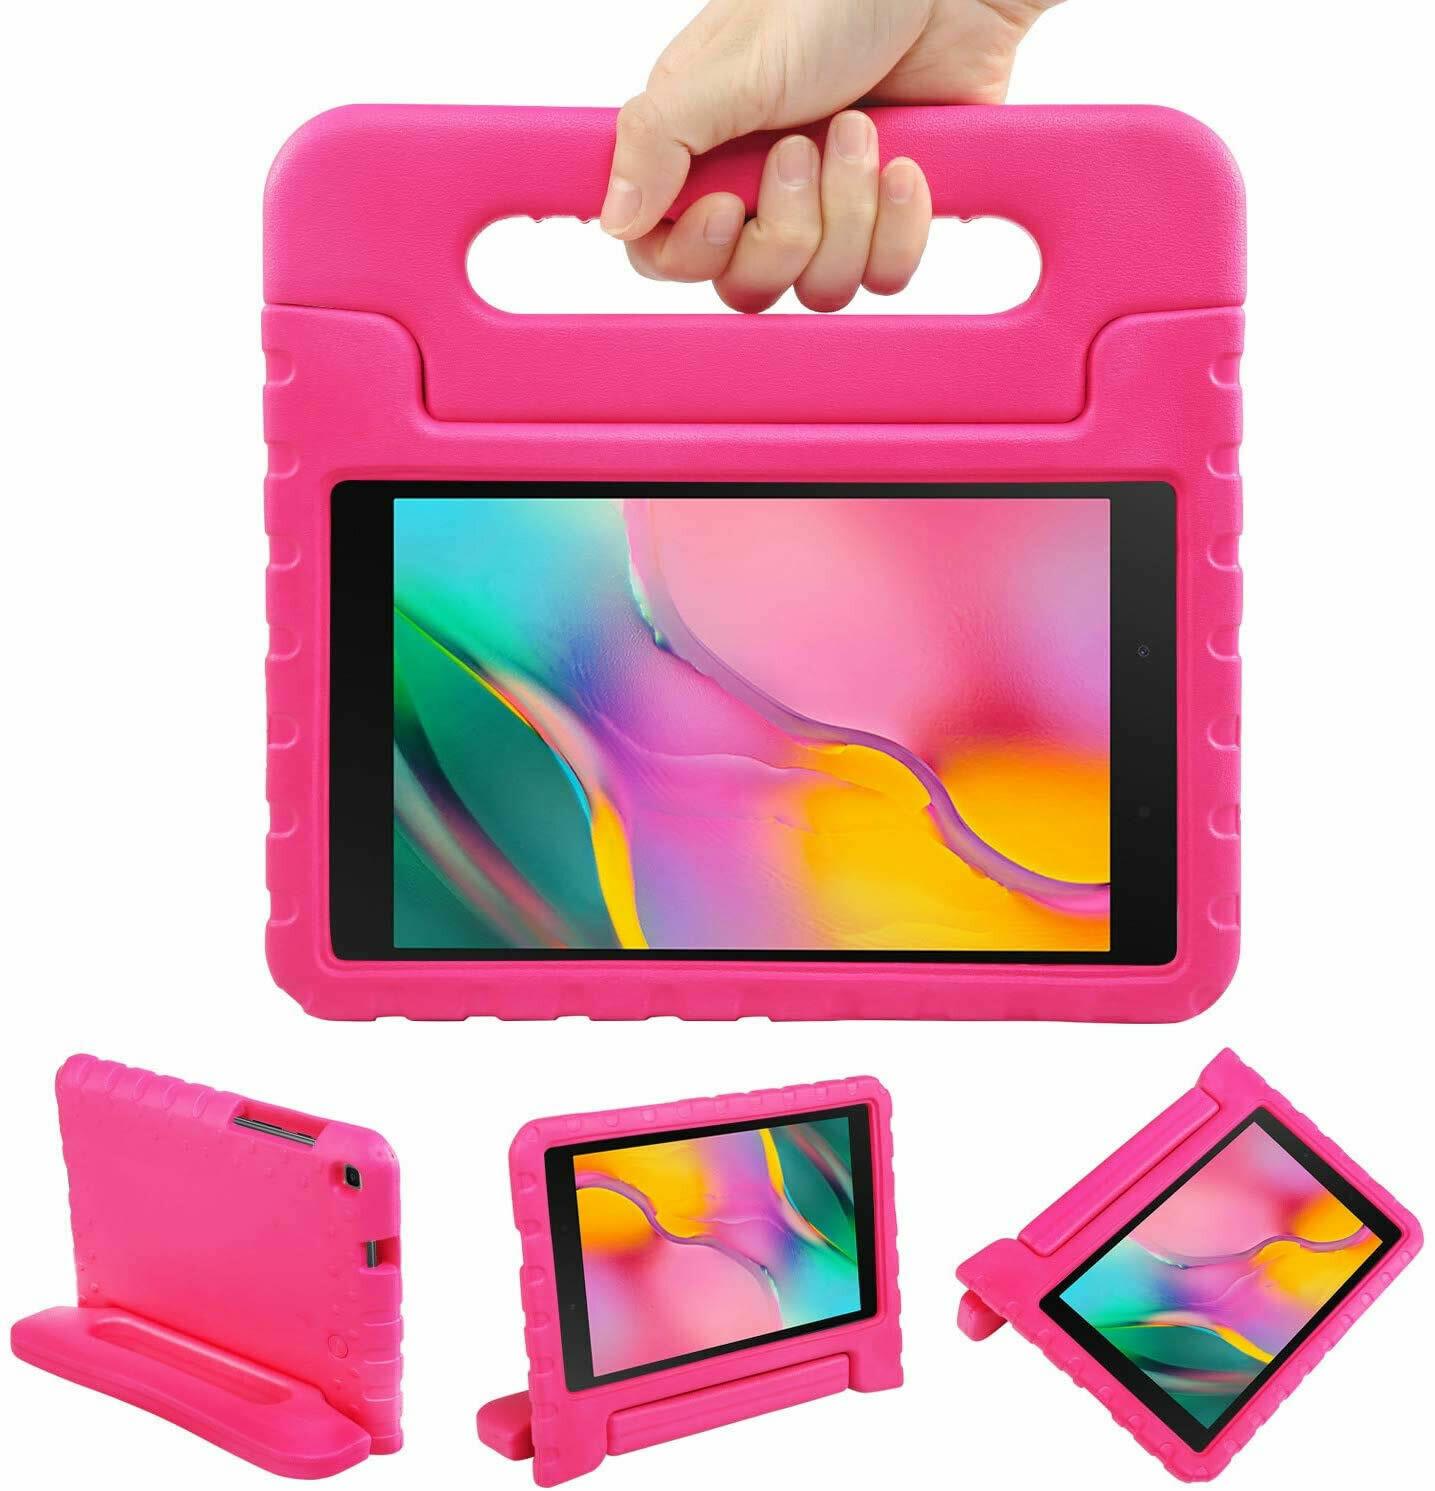 Funda LEADSTAR para Samsung Galaxy Tab A 8.0 2019, Color Rosa